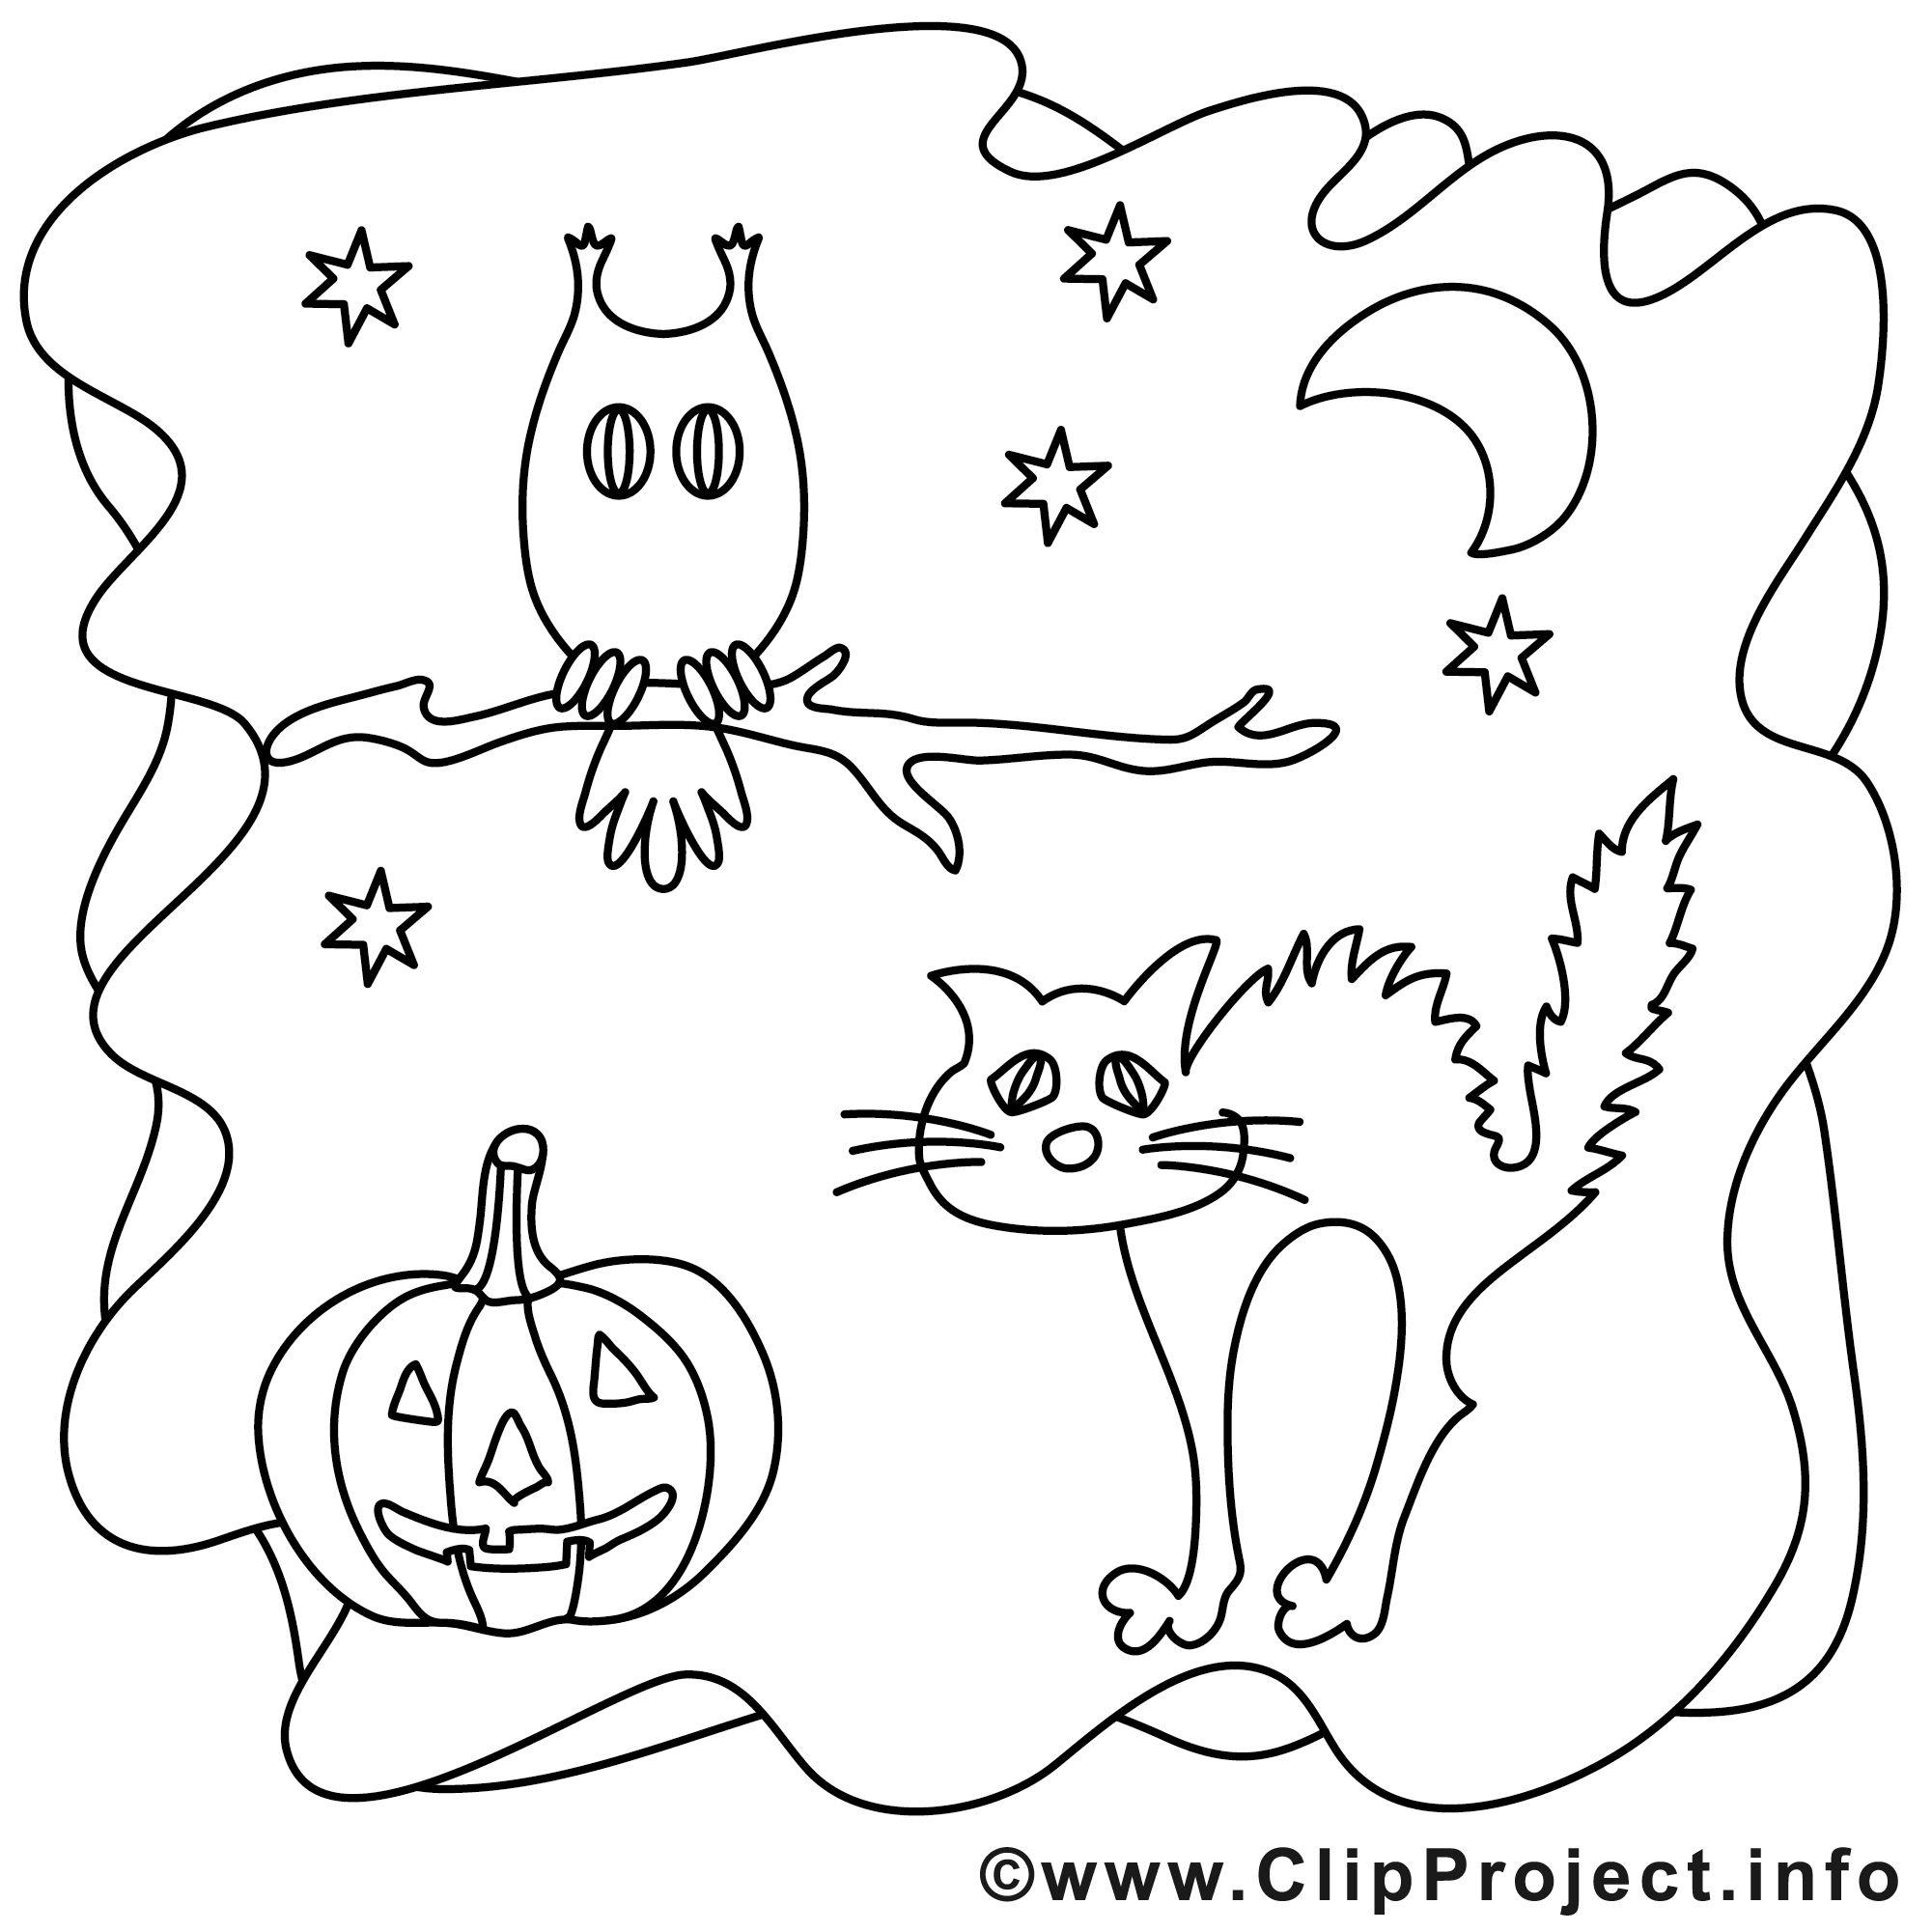 Ten Grossartig Kurbis Halloween Malvorlage Ausdruck 2020 Malvorlagen Halloween Malvorlagen Ausmalbilder